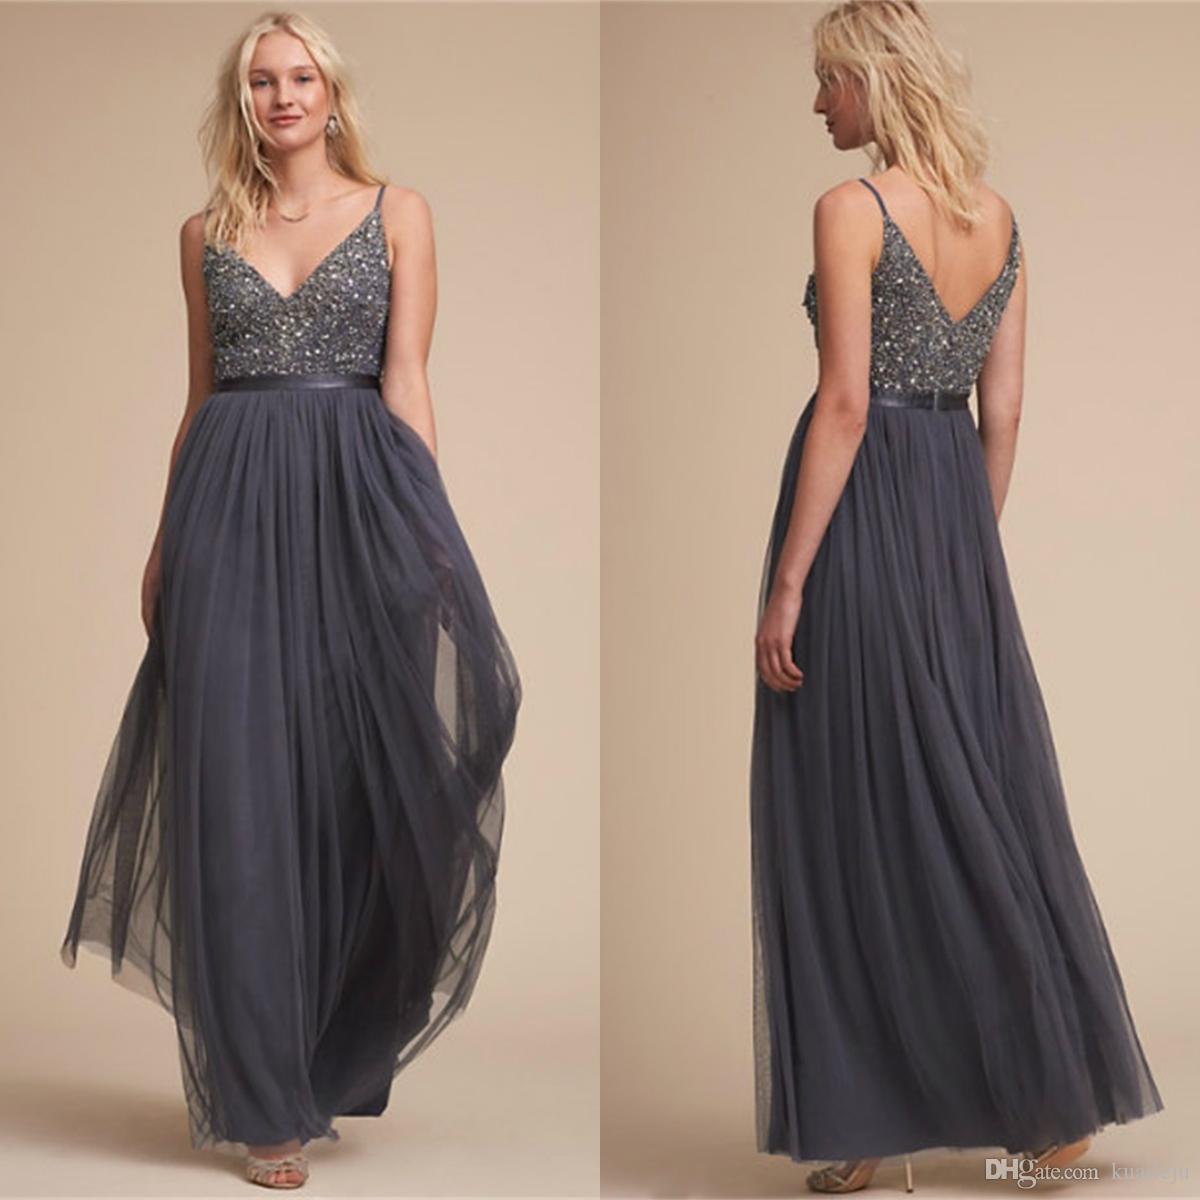 2020 Sexy Mother Dresses V Neck Spagetti Strap Mother Of The Bride Dress Length Lantins Formal Dress